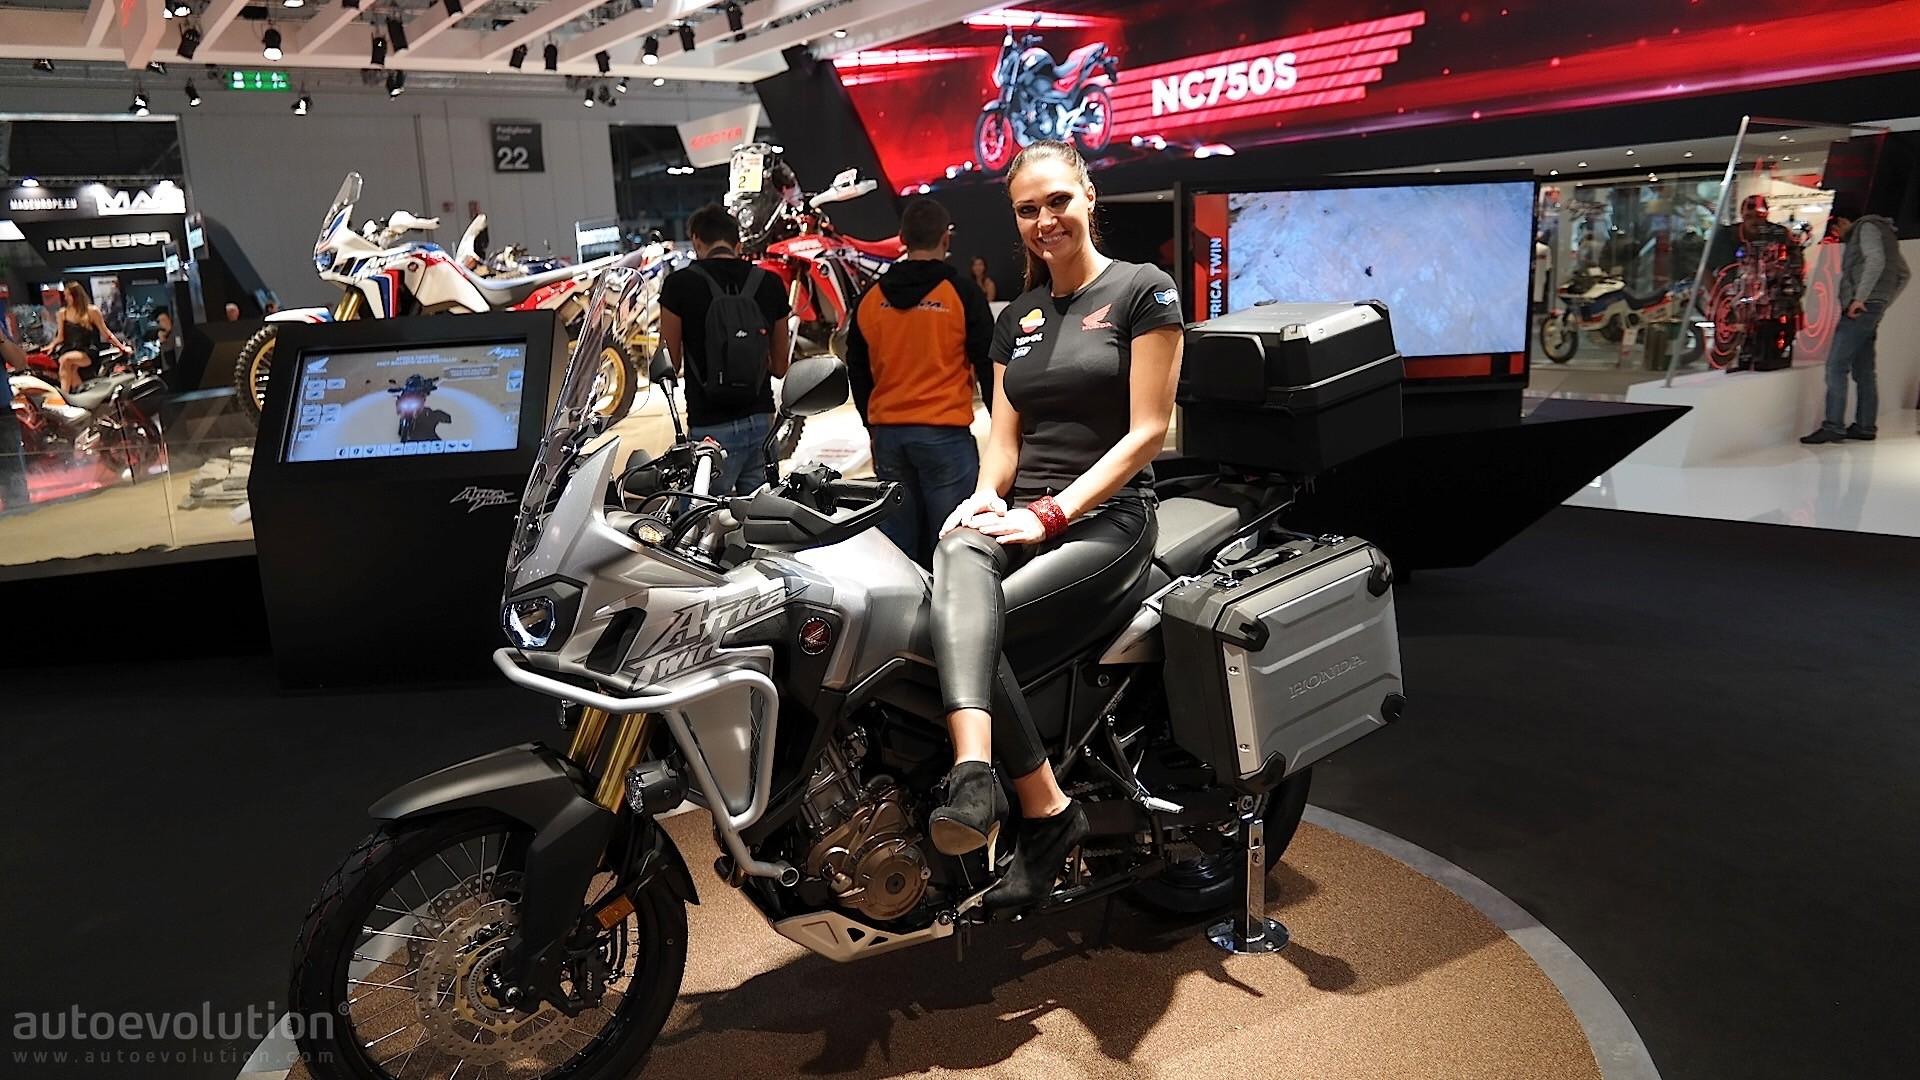 Eicma 2015  New Honda Africa Twin In The Flesh